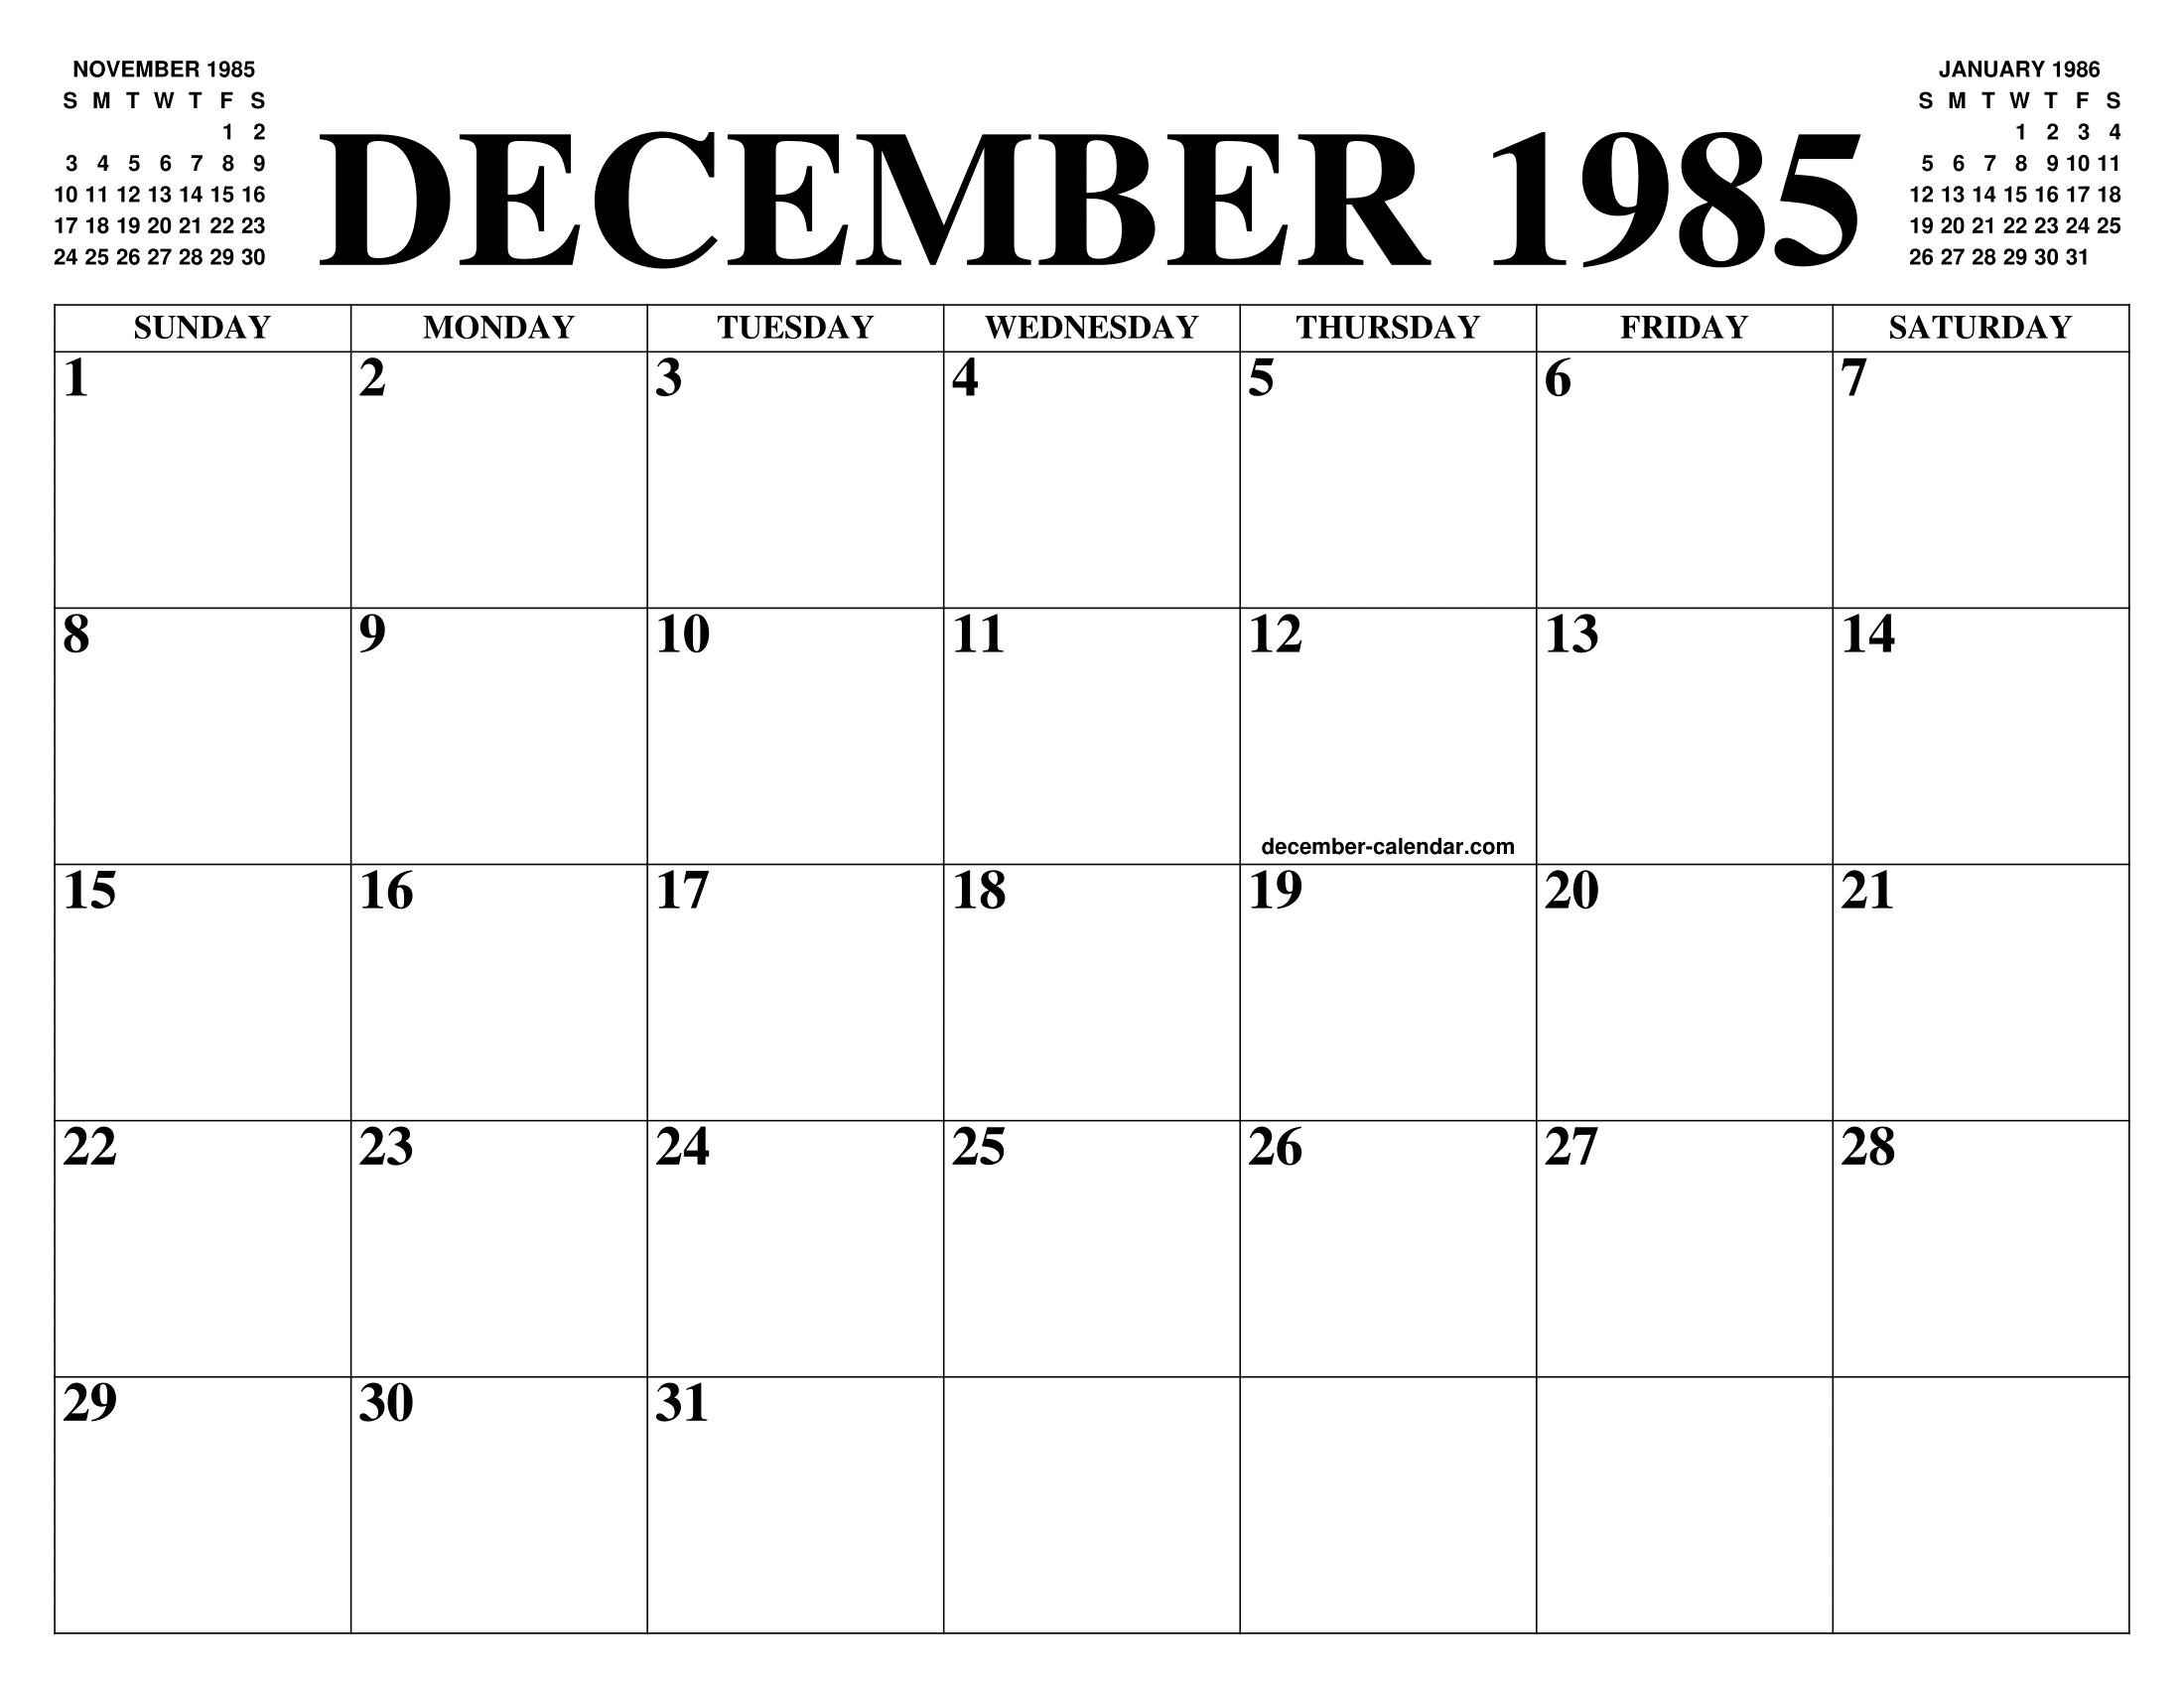 1985 Calendar.December 1985 Calendar Of The Month Free Printable December